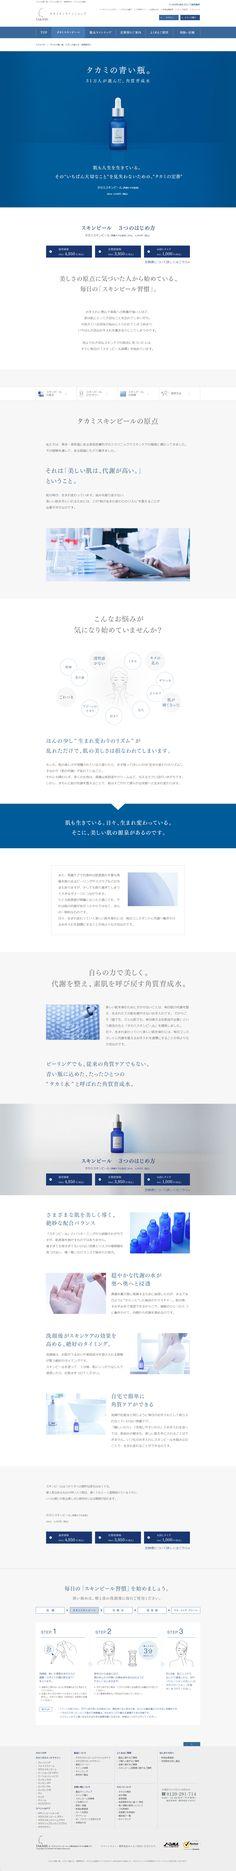 https://junhashimoto.jp/fs/junhashimoto/MemberEntryEdit.html